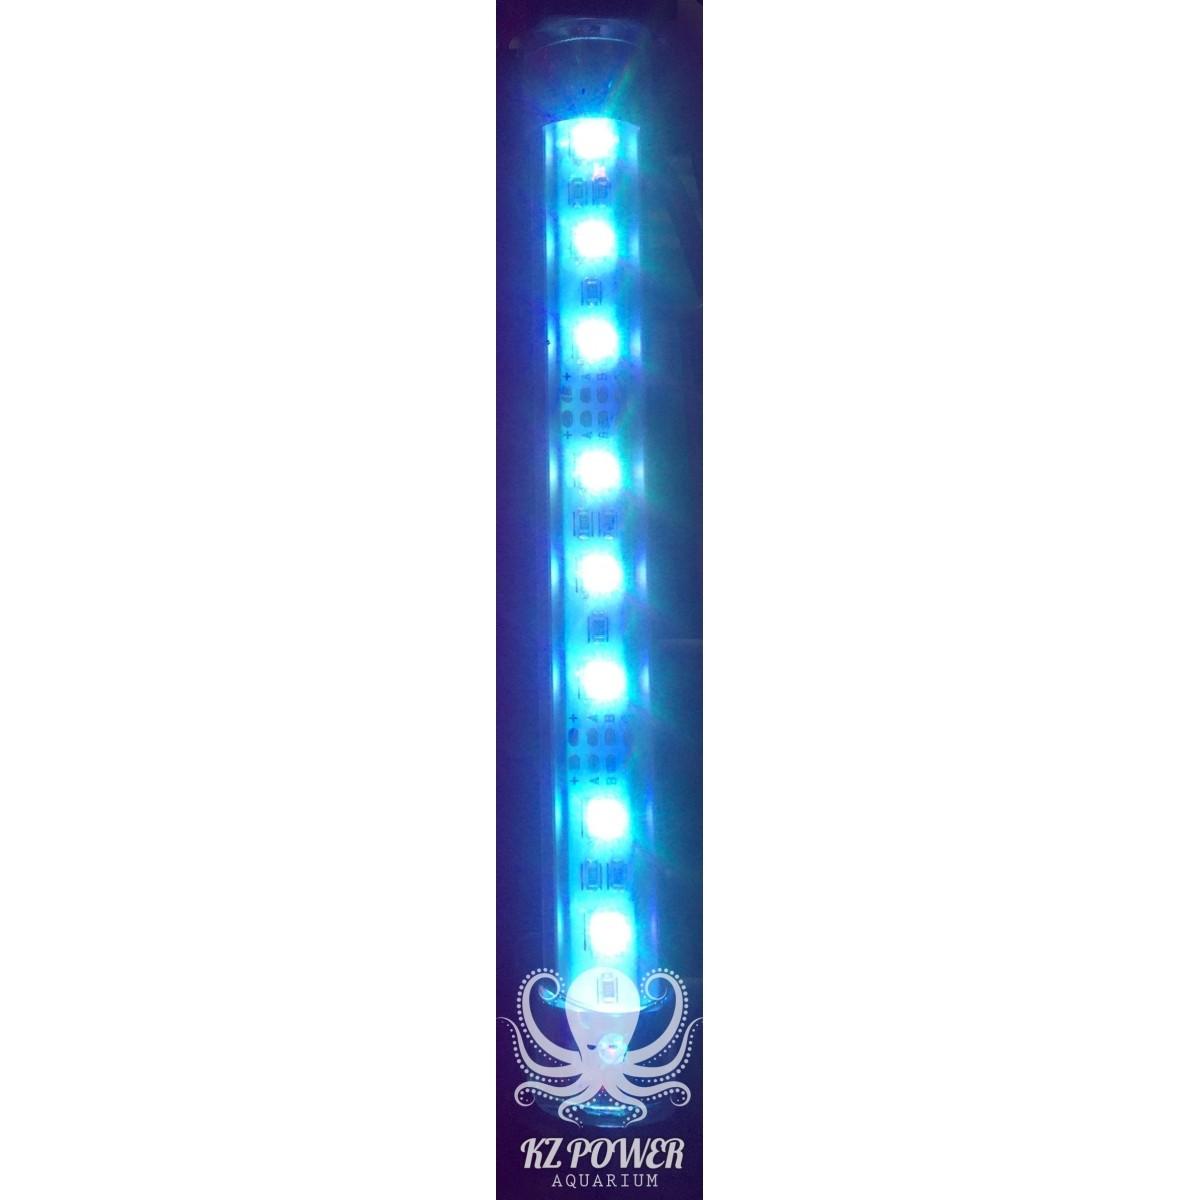 Luminaria Led Aqualumi RGB 95cm + Fonte Bivolt  - KZ Power